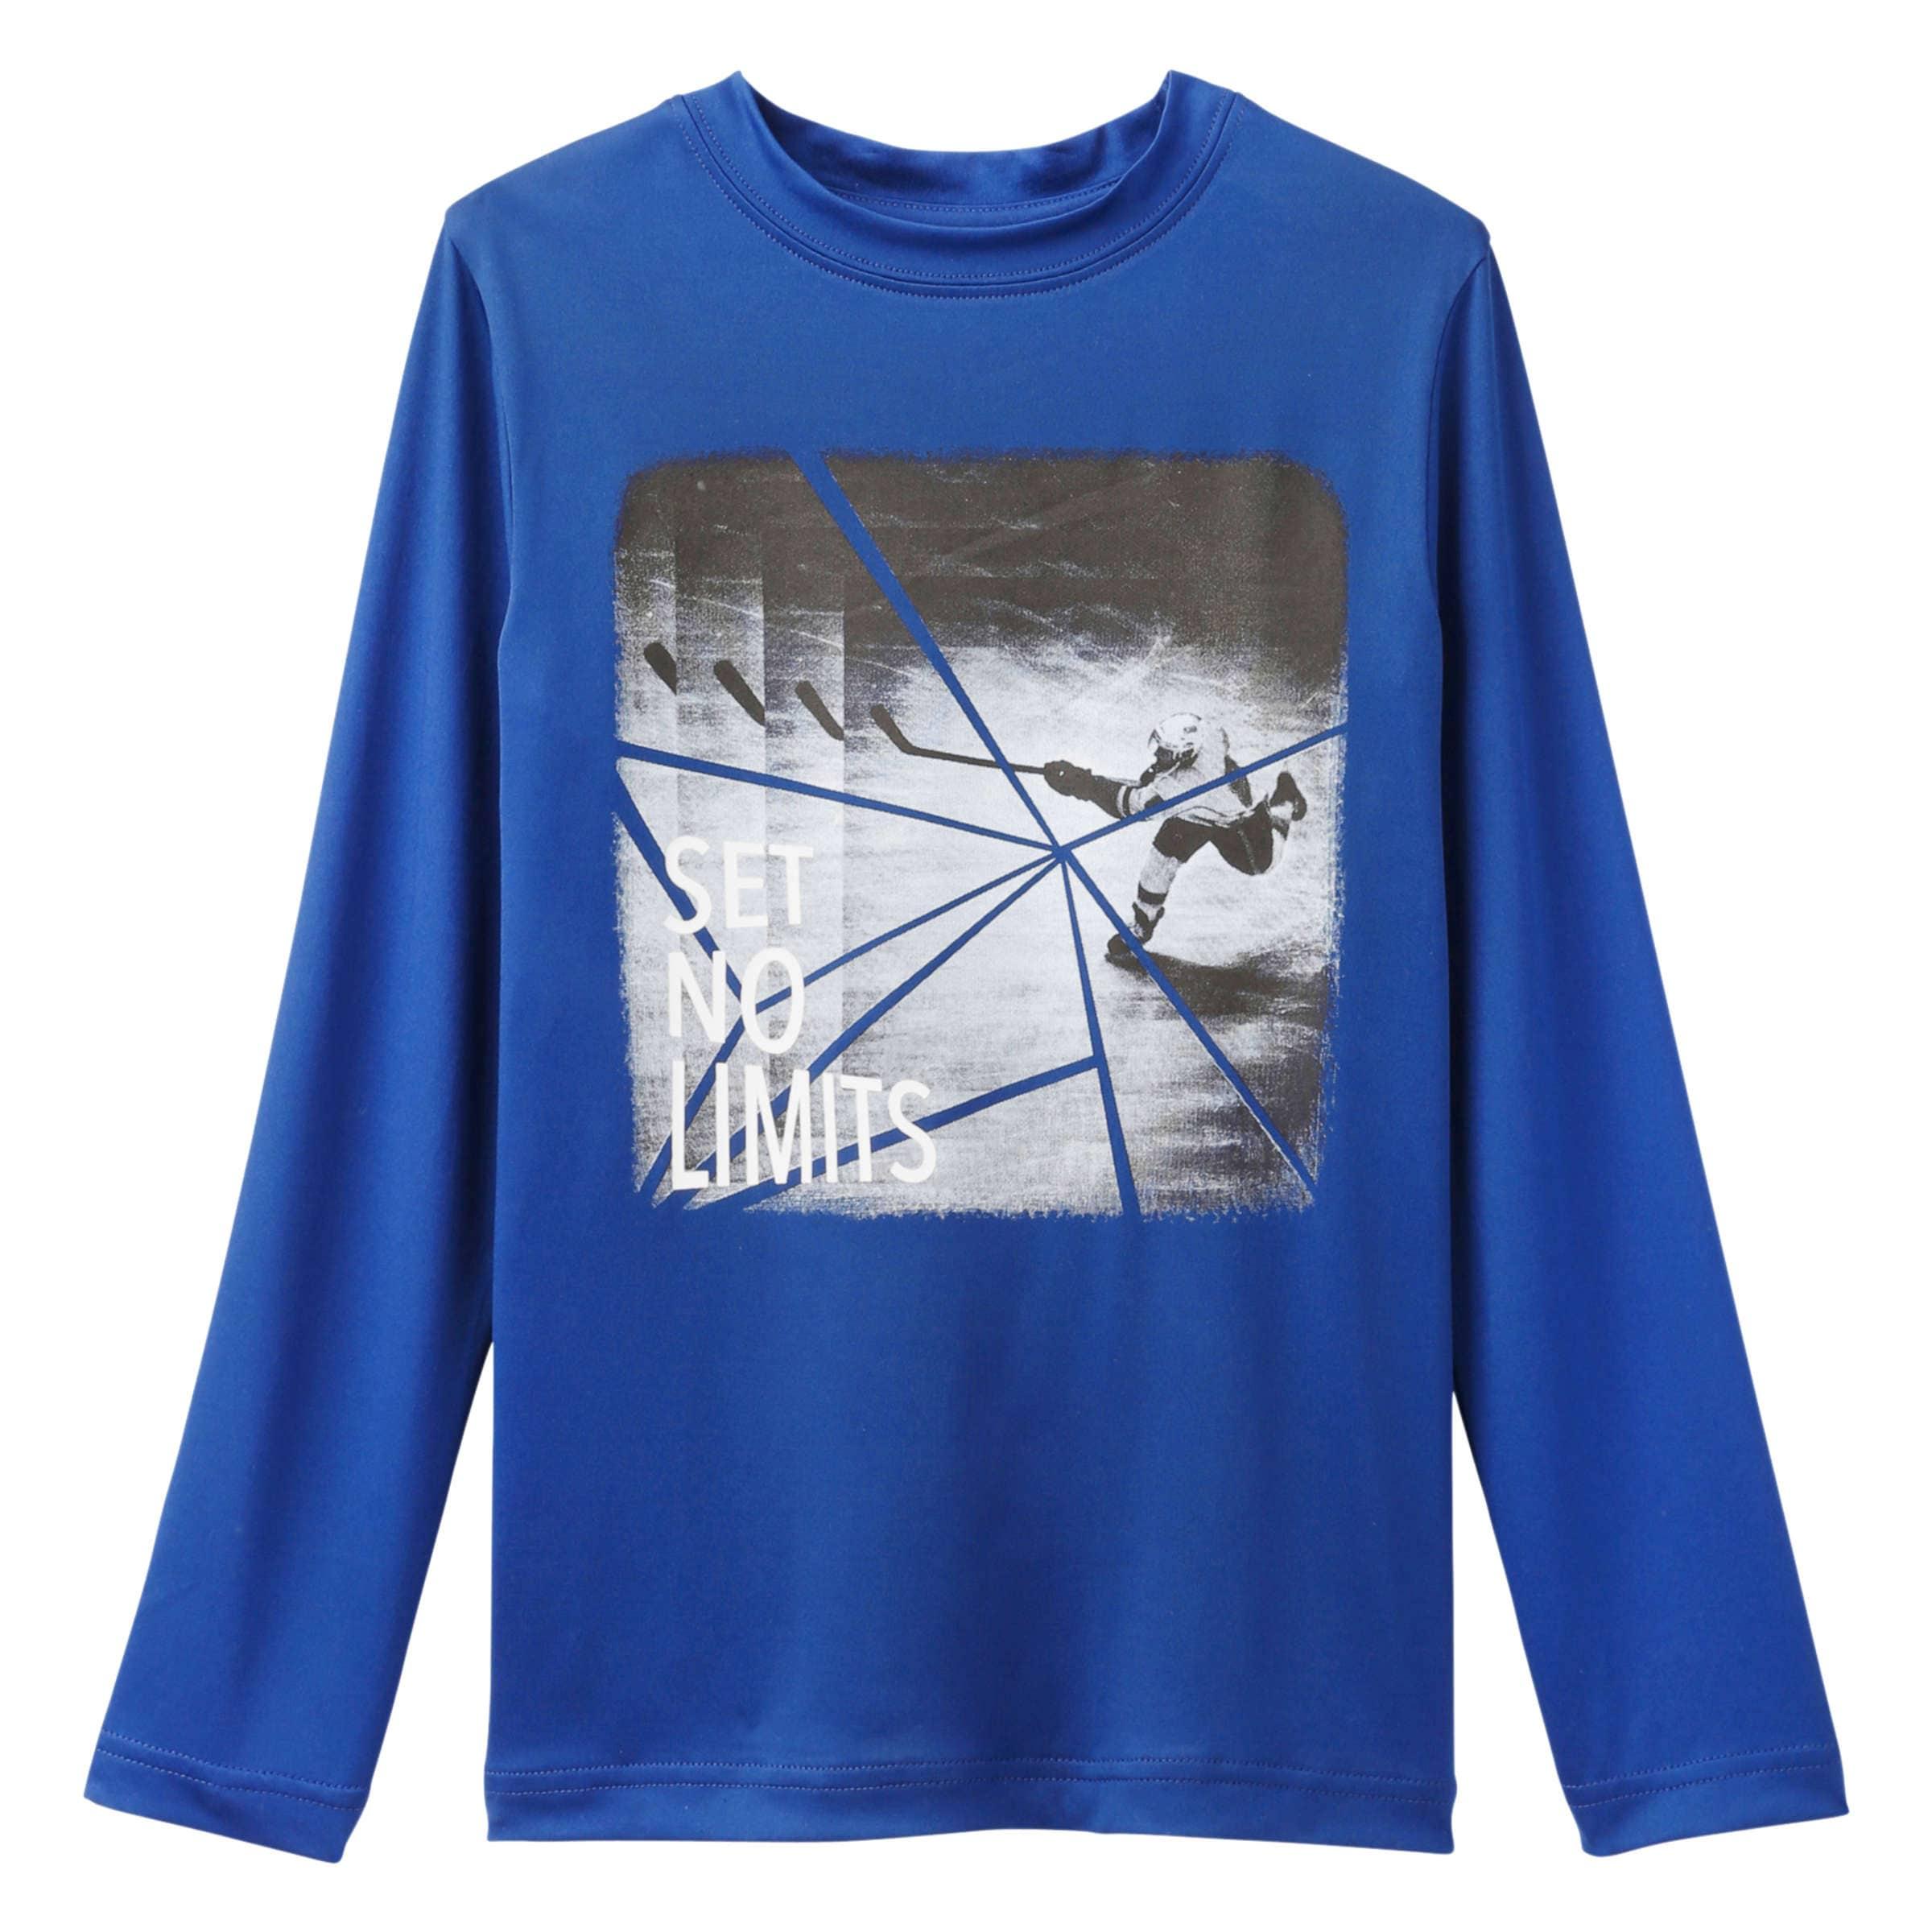 ae7181f9 Kid Boys' Graphic Long Sleeve Tee in Blue Jay from Joe Fresh